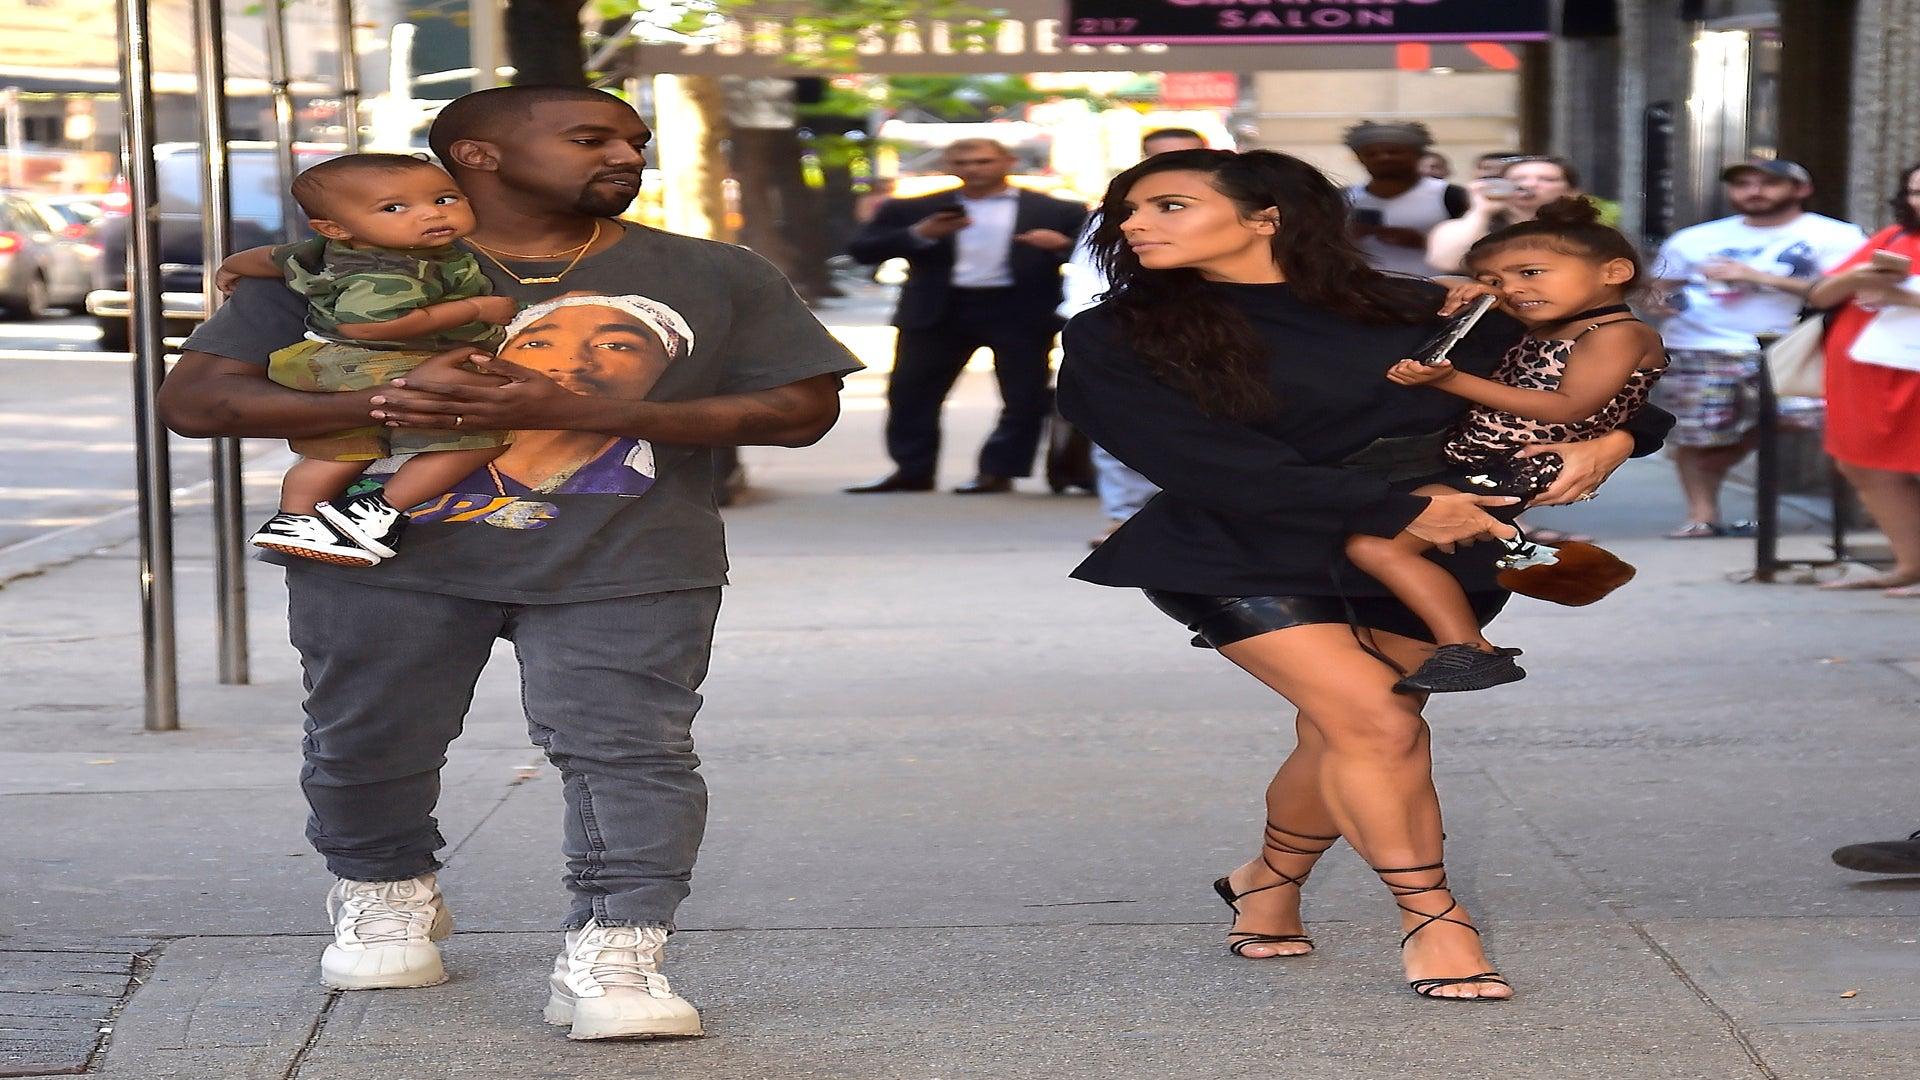 North And Saint In Kim Kardashian, Kanye West Home Videos